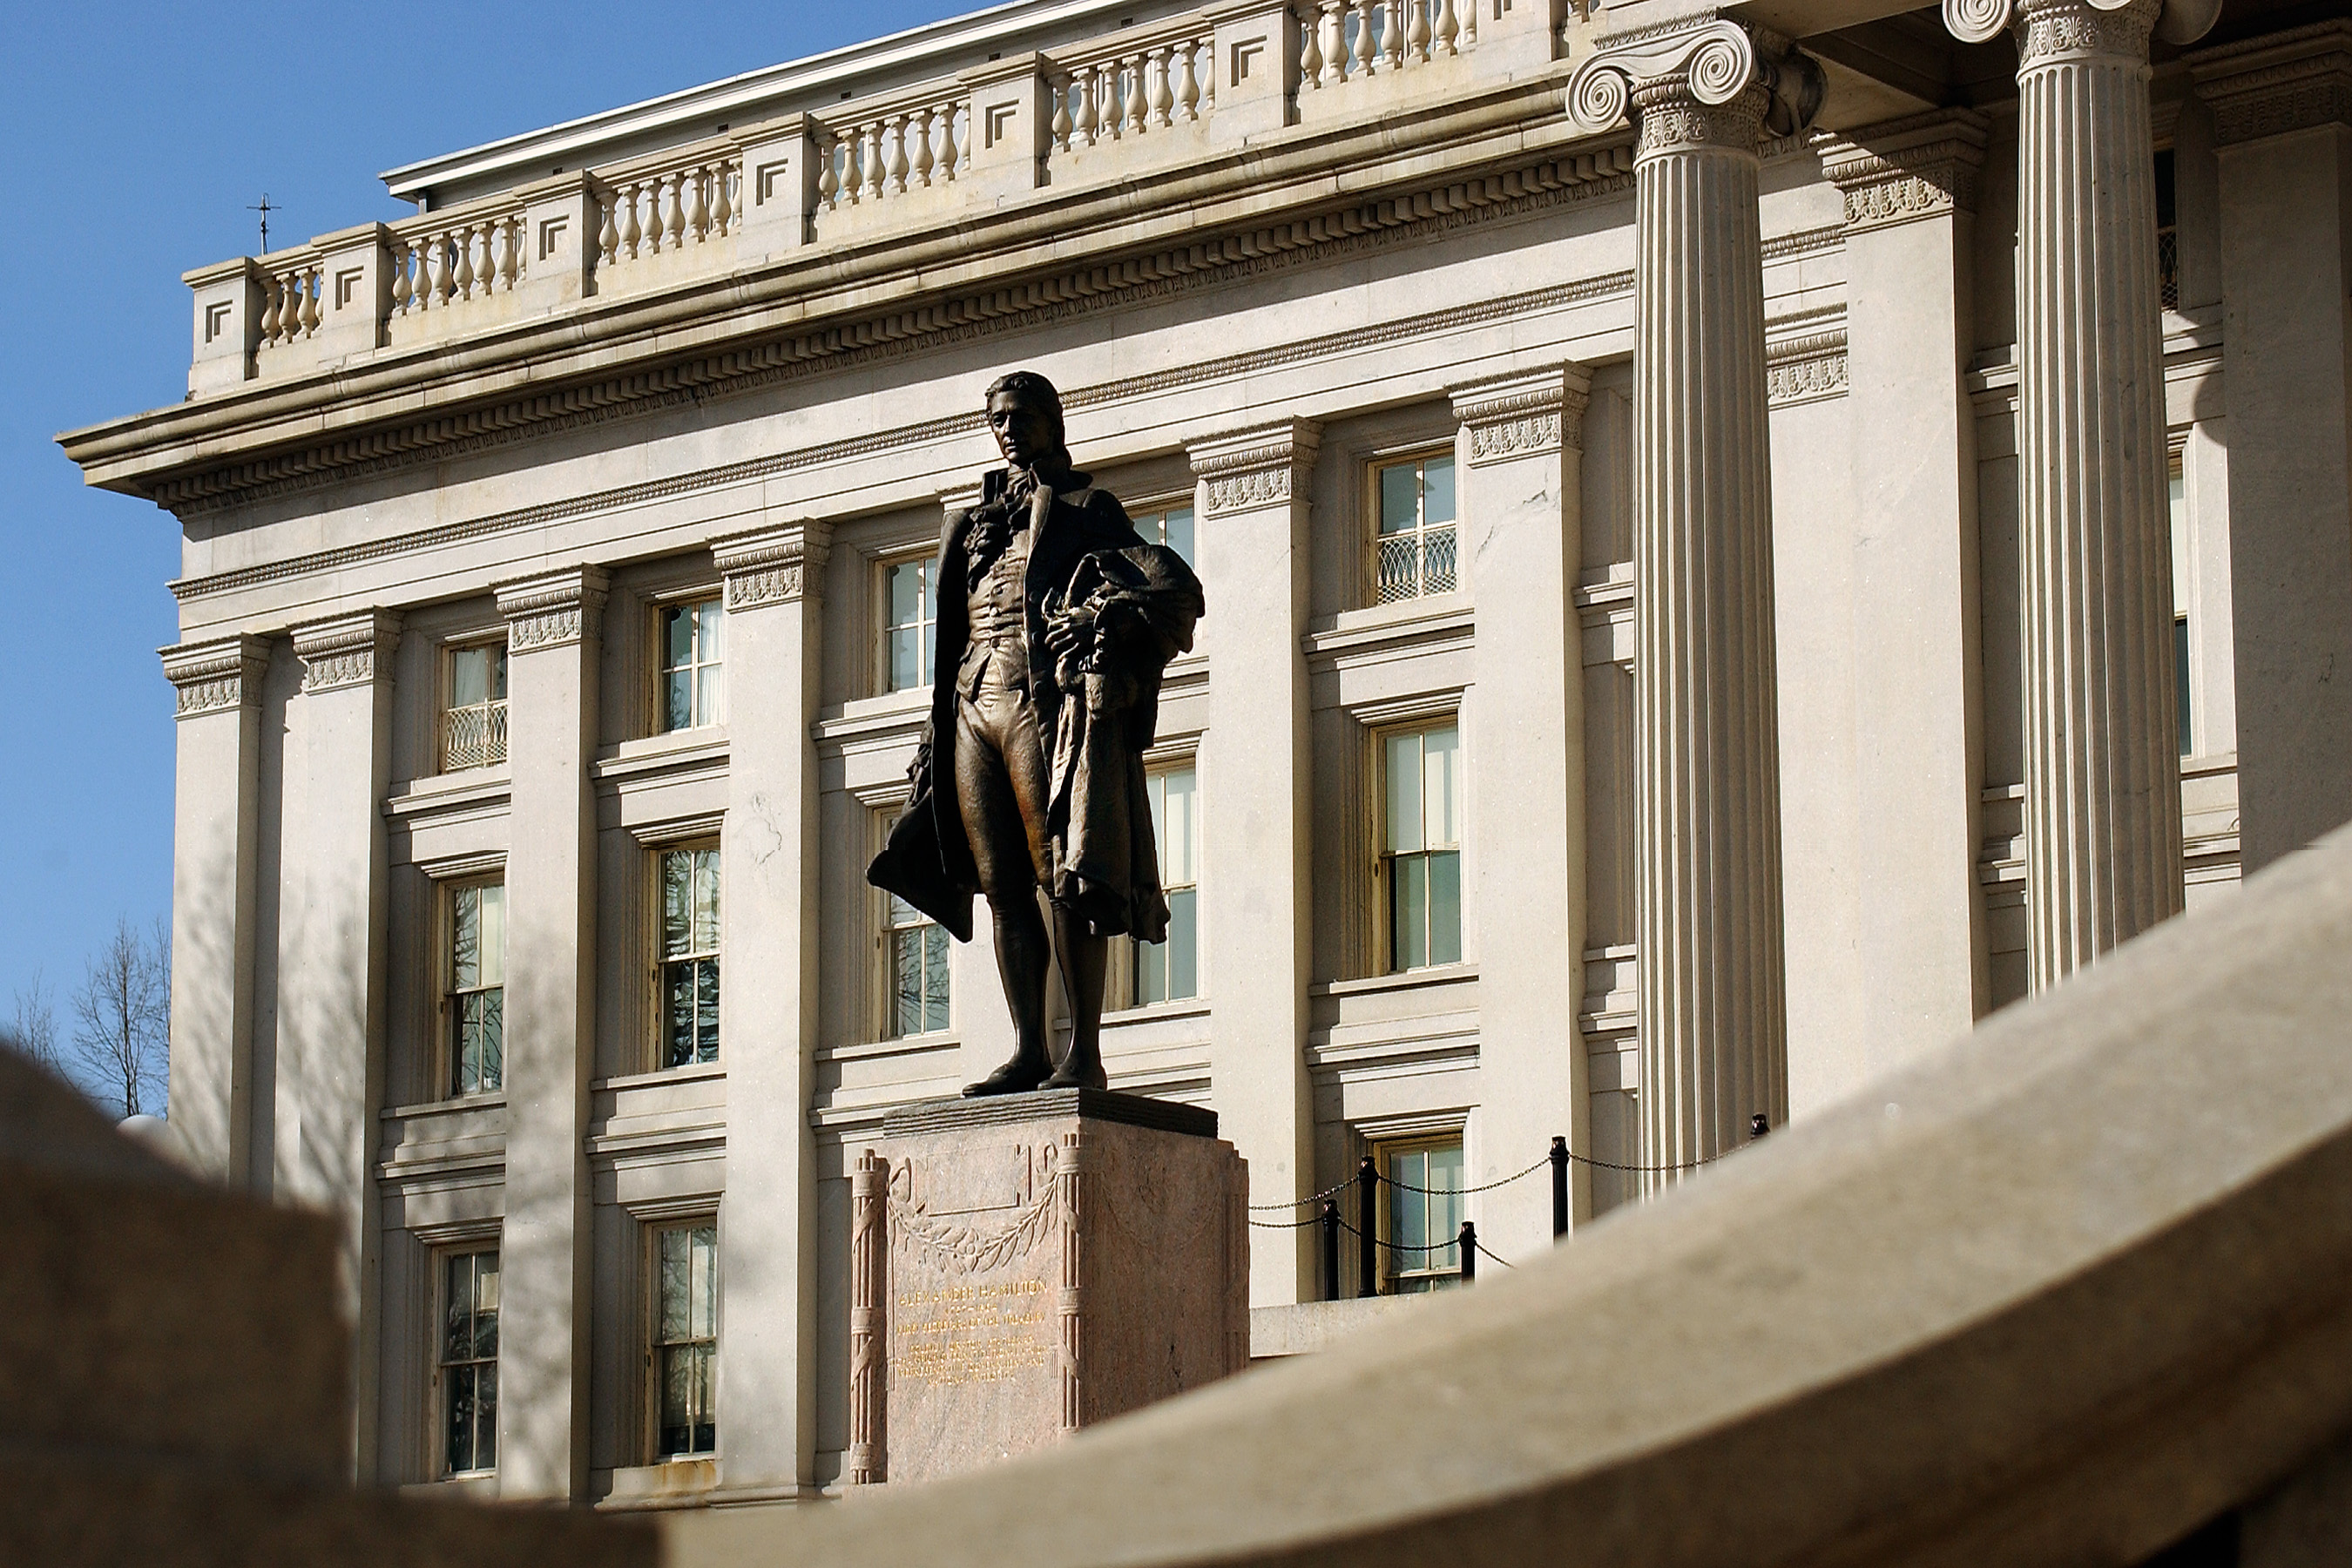 Statue of Alexander Hamilton in front of US Treasury Building